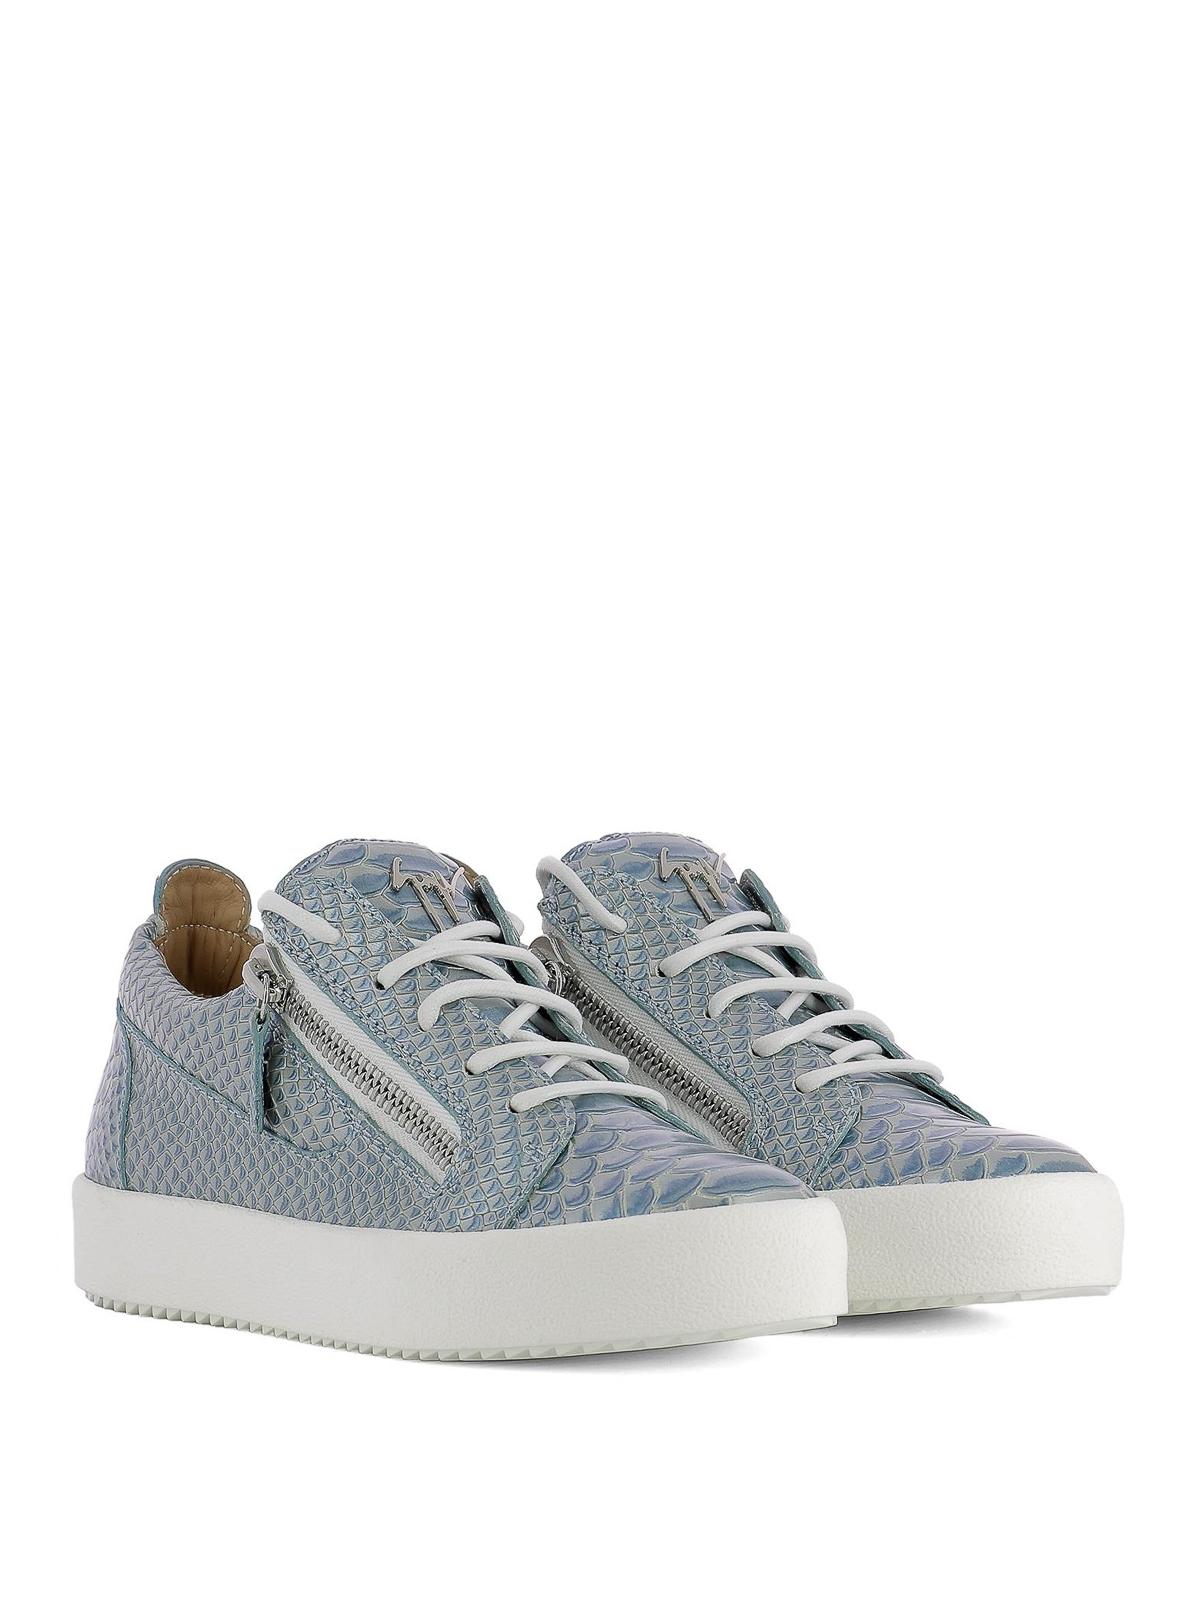 snake embossed Gail sneakers - Grey Giuseppe Zanotti DdIEQrxr8g